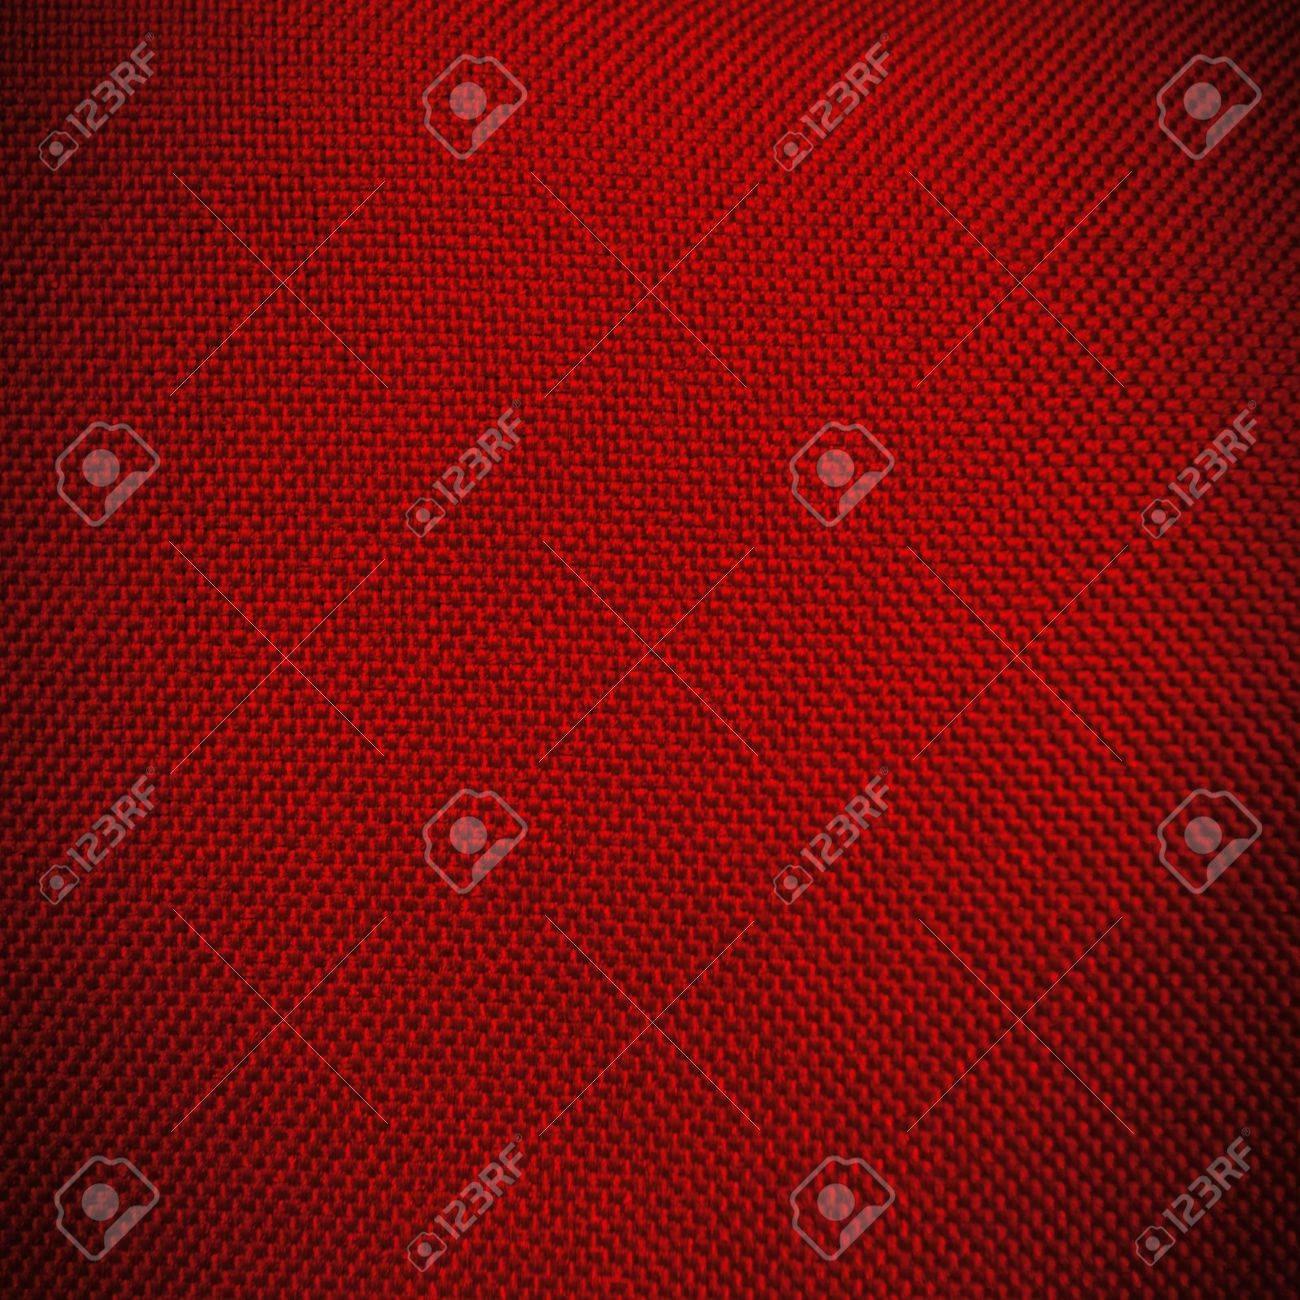 red canvas texture background with dark vignette Stock Photo - 16163015